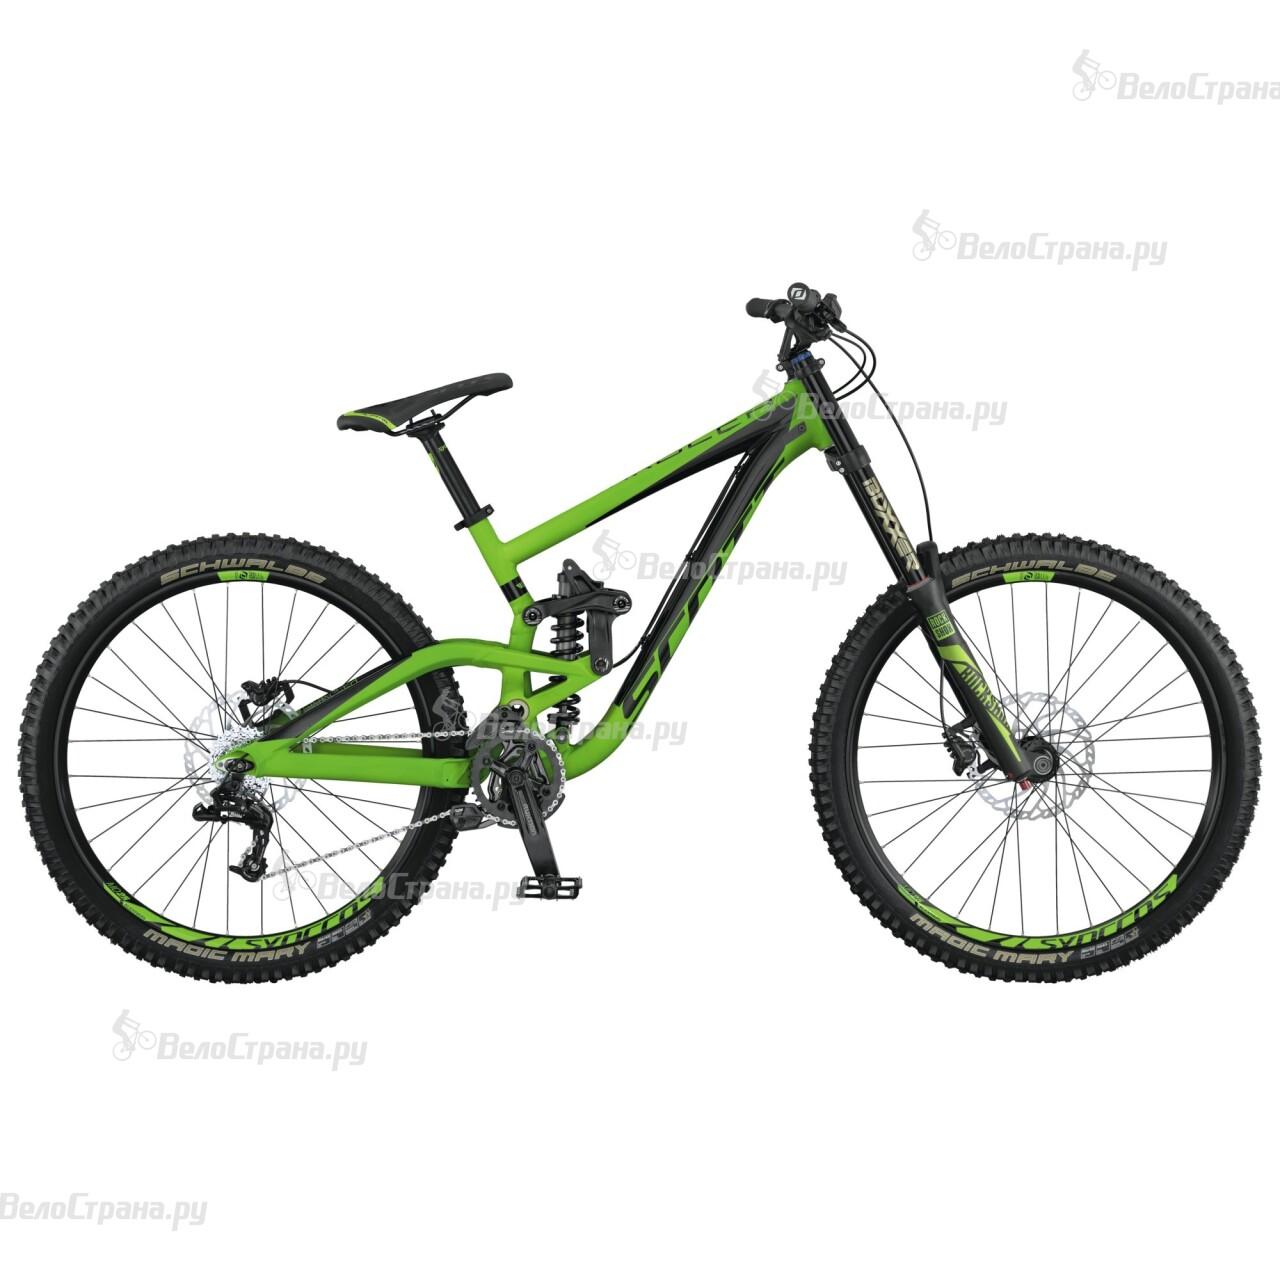 Велосипед Scott GAMBLER 730 (2015) велосипед scott gambler 720 2015